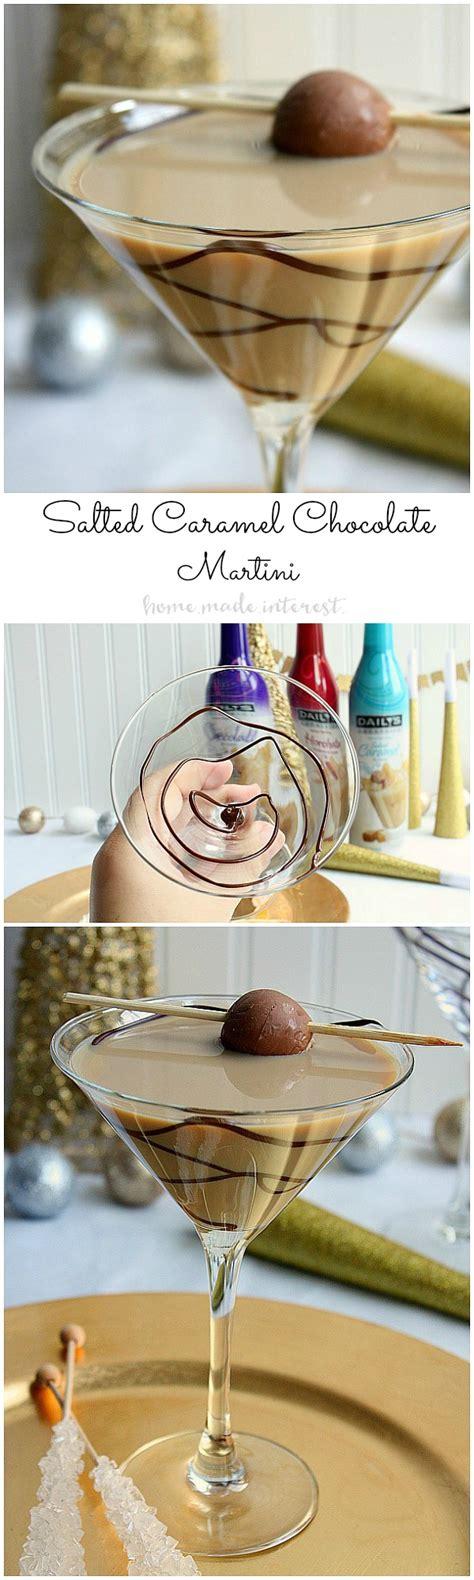 salted caramel martini recipe salted caramel chocolate martini signature drink for a